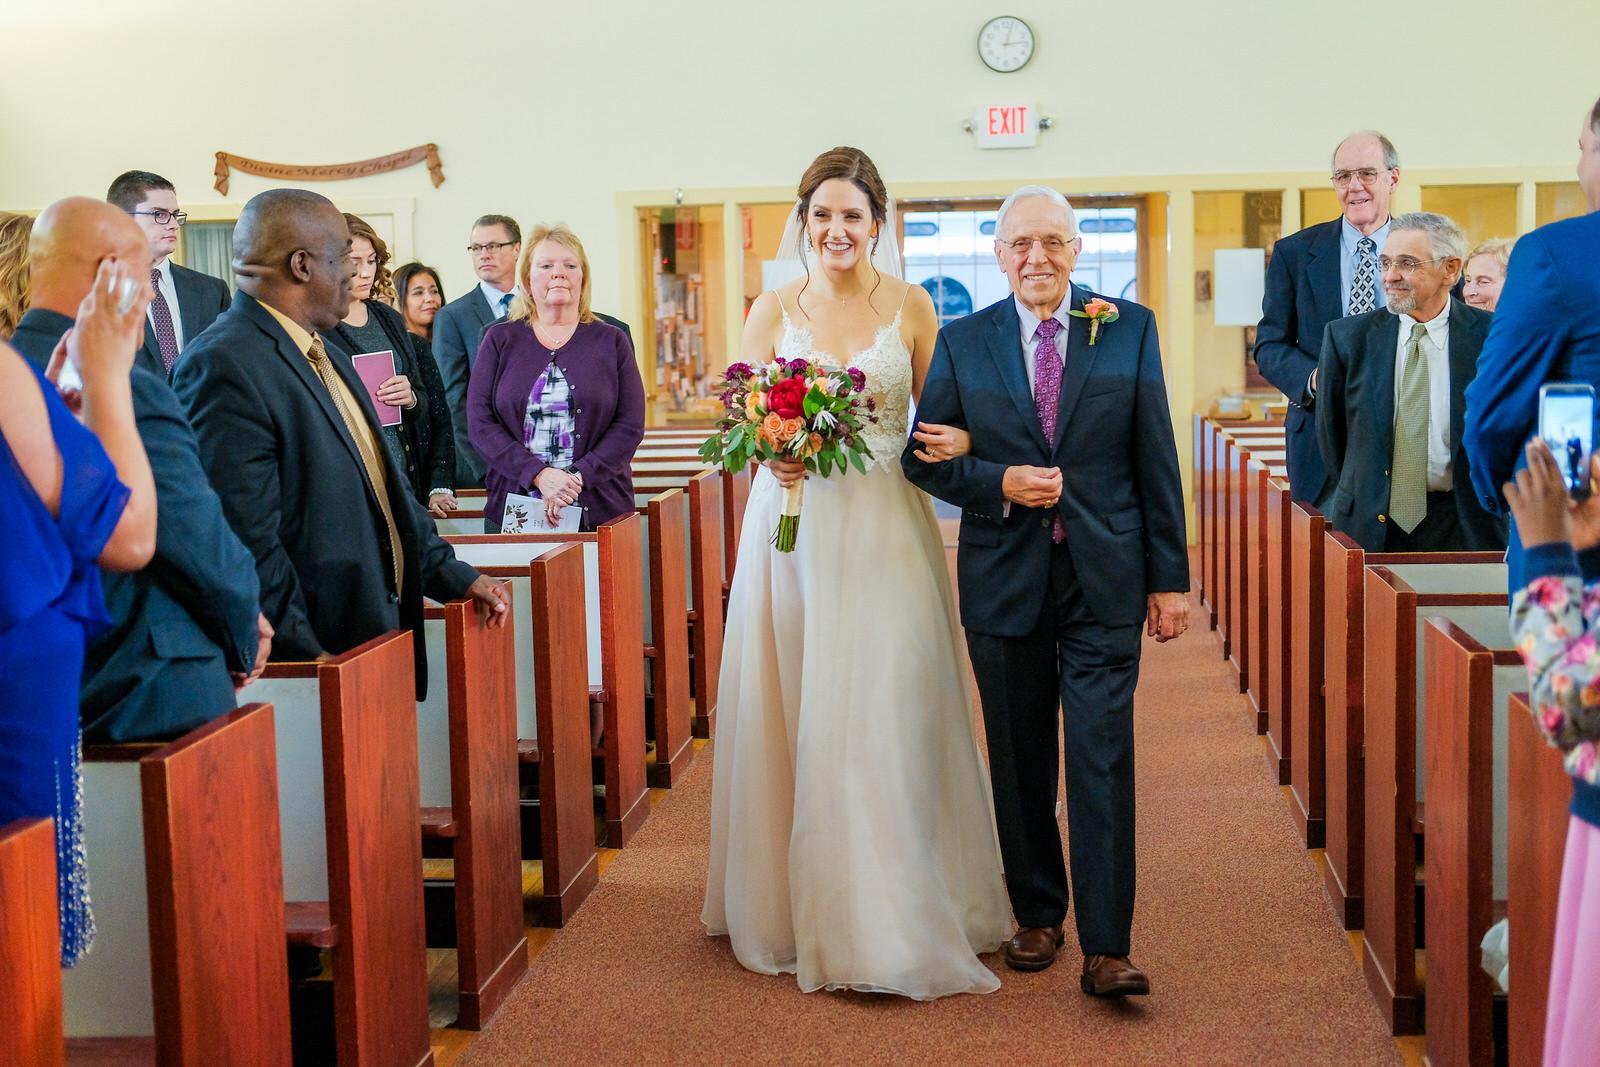 Zorvino-Vineyards-Fall-Wedding-Photography-207.jpg